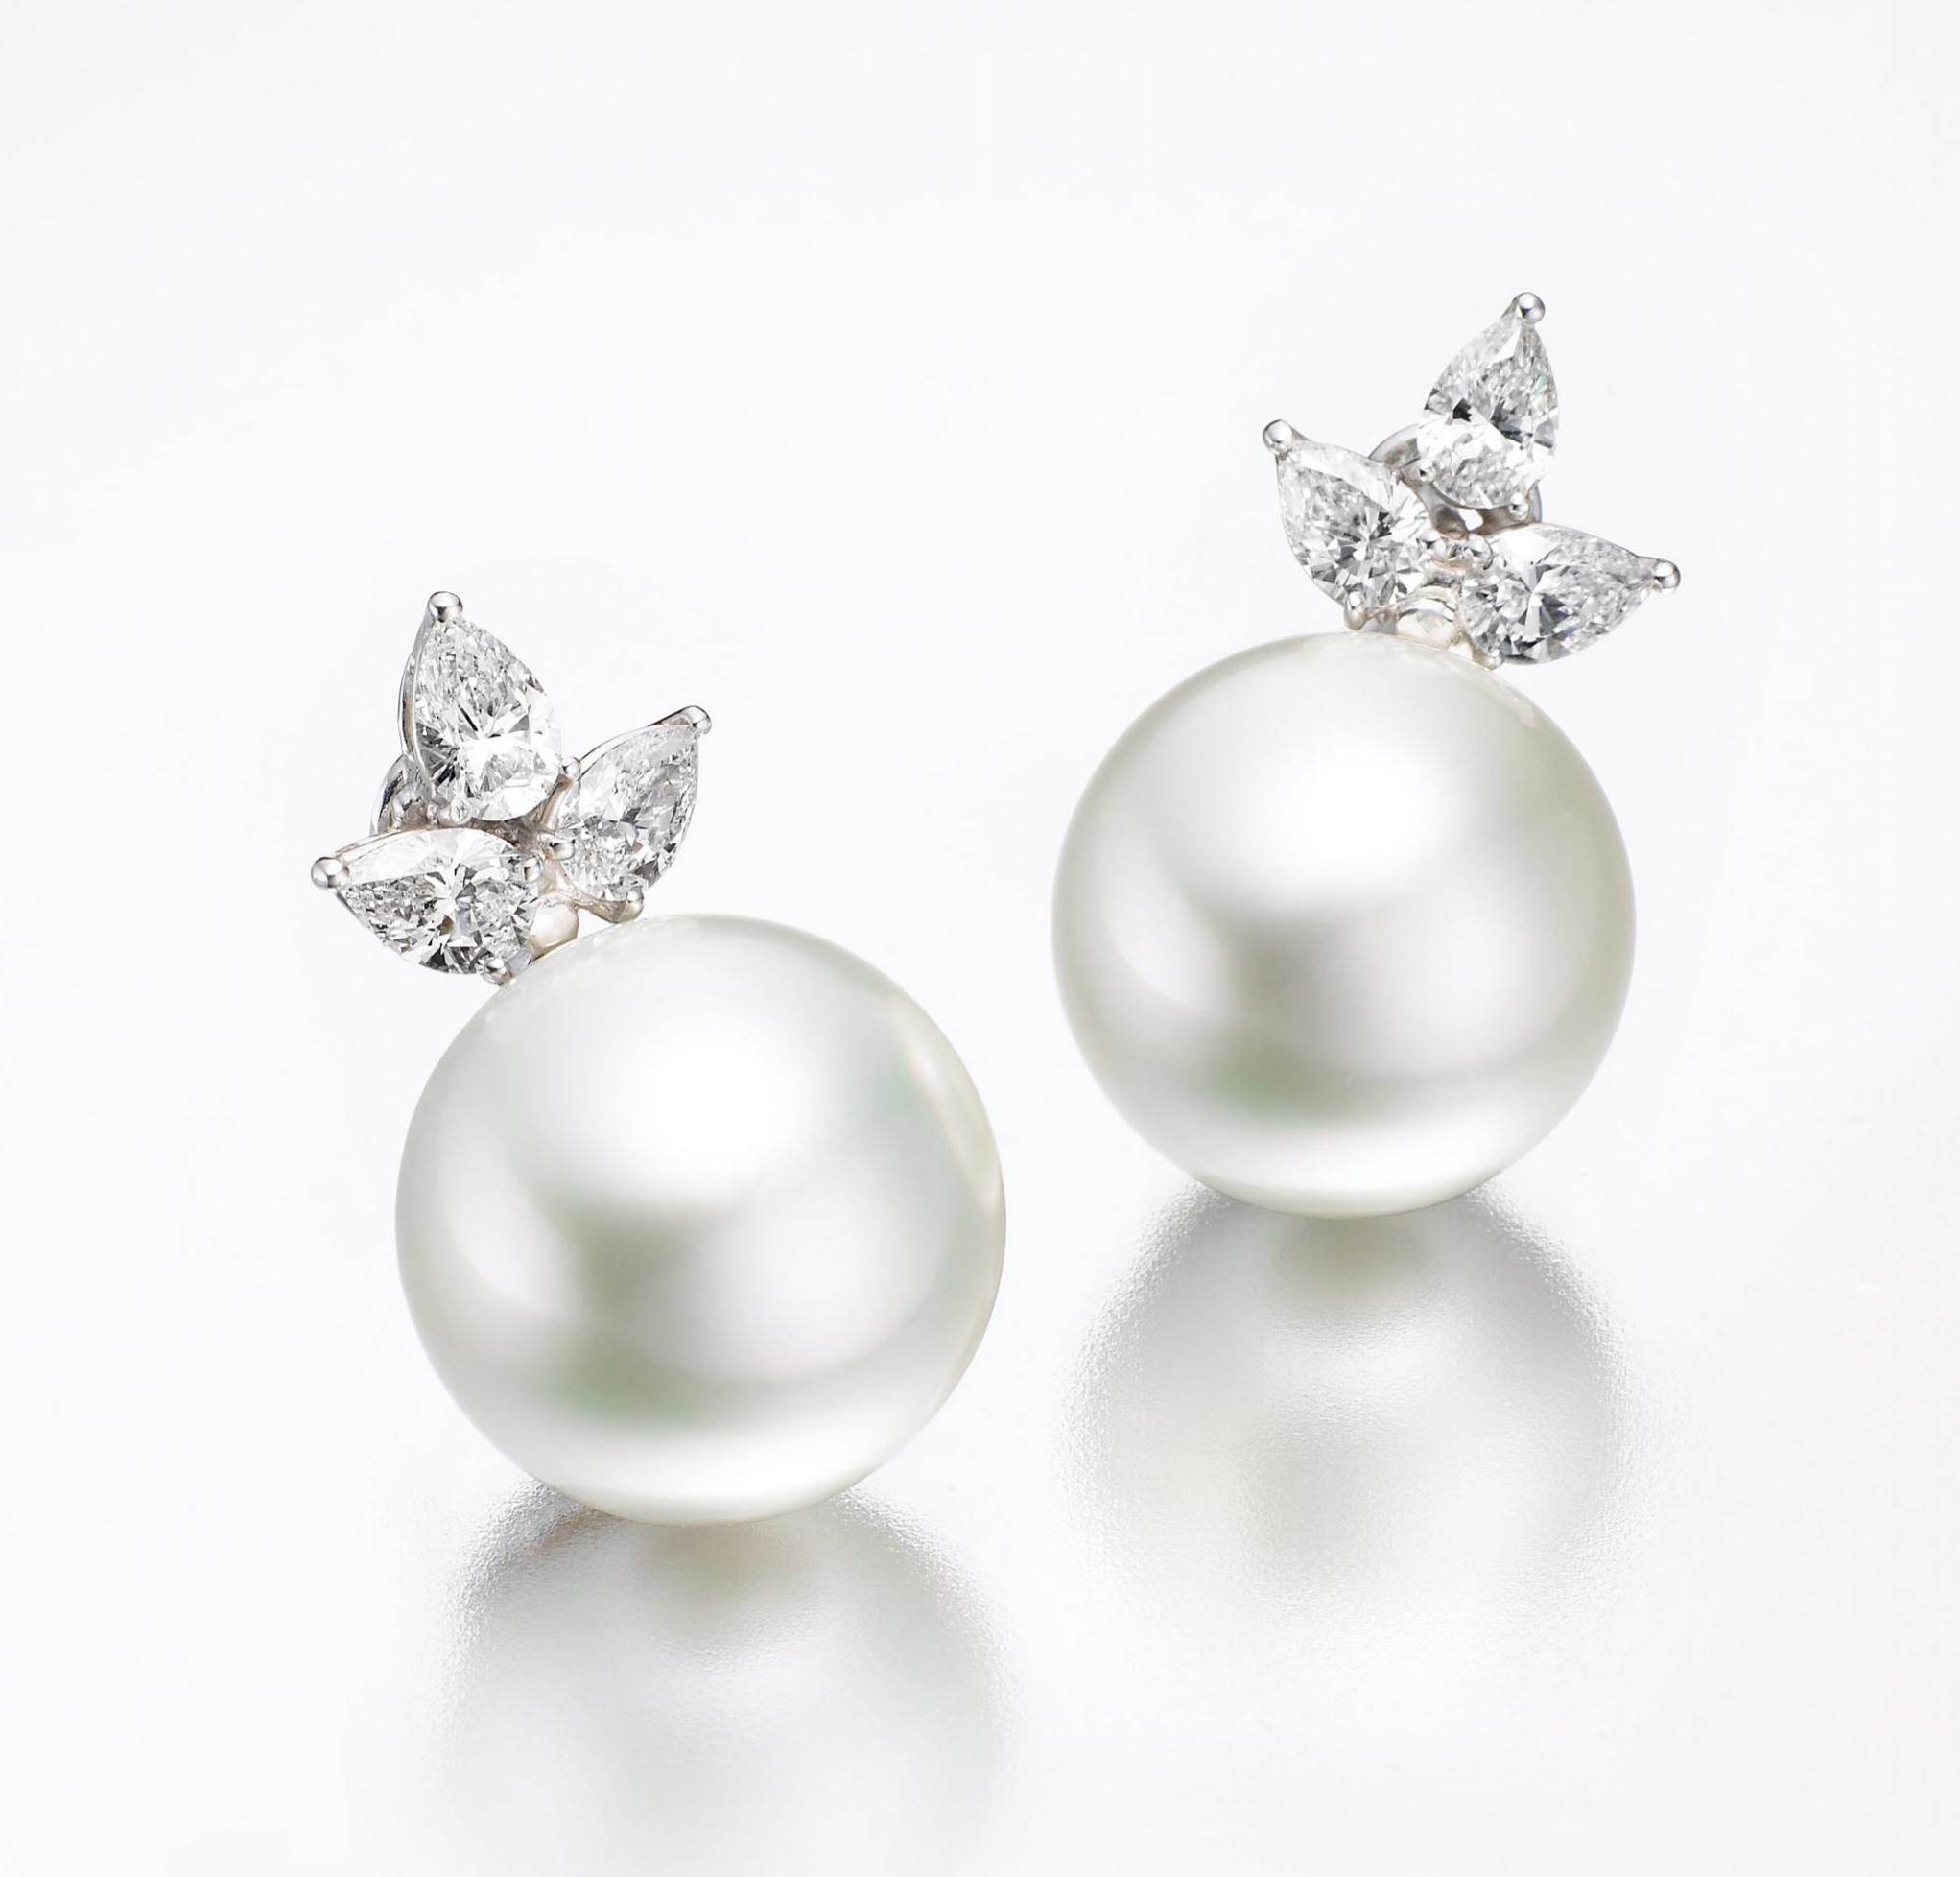 SOUTH SEA PEARL AND DIAMOND EARRINGS CLUSTER DIAMOND PENDANT BESPOKE FINE JEWELLERY BY SHAHINA HATTA